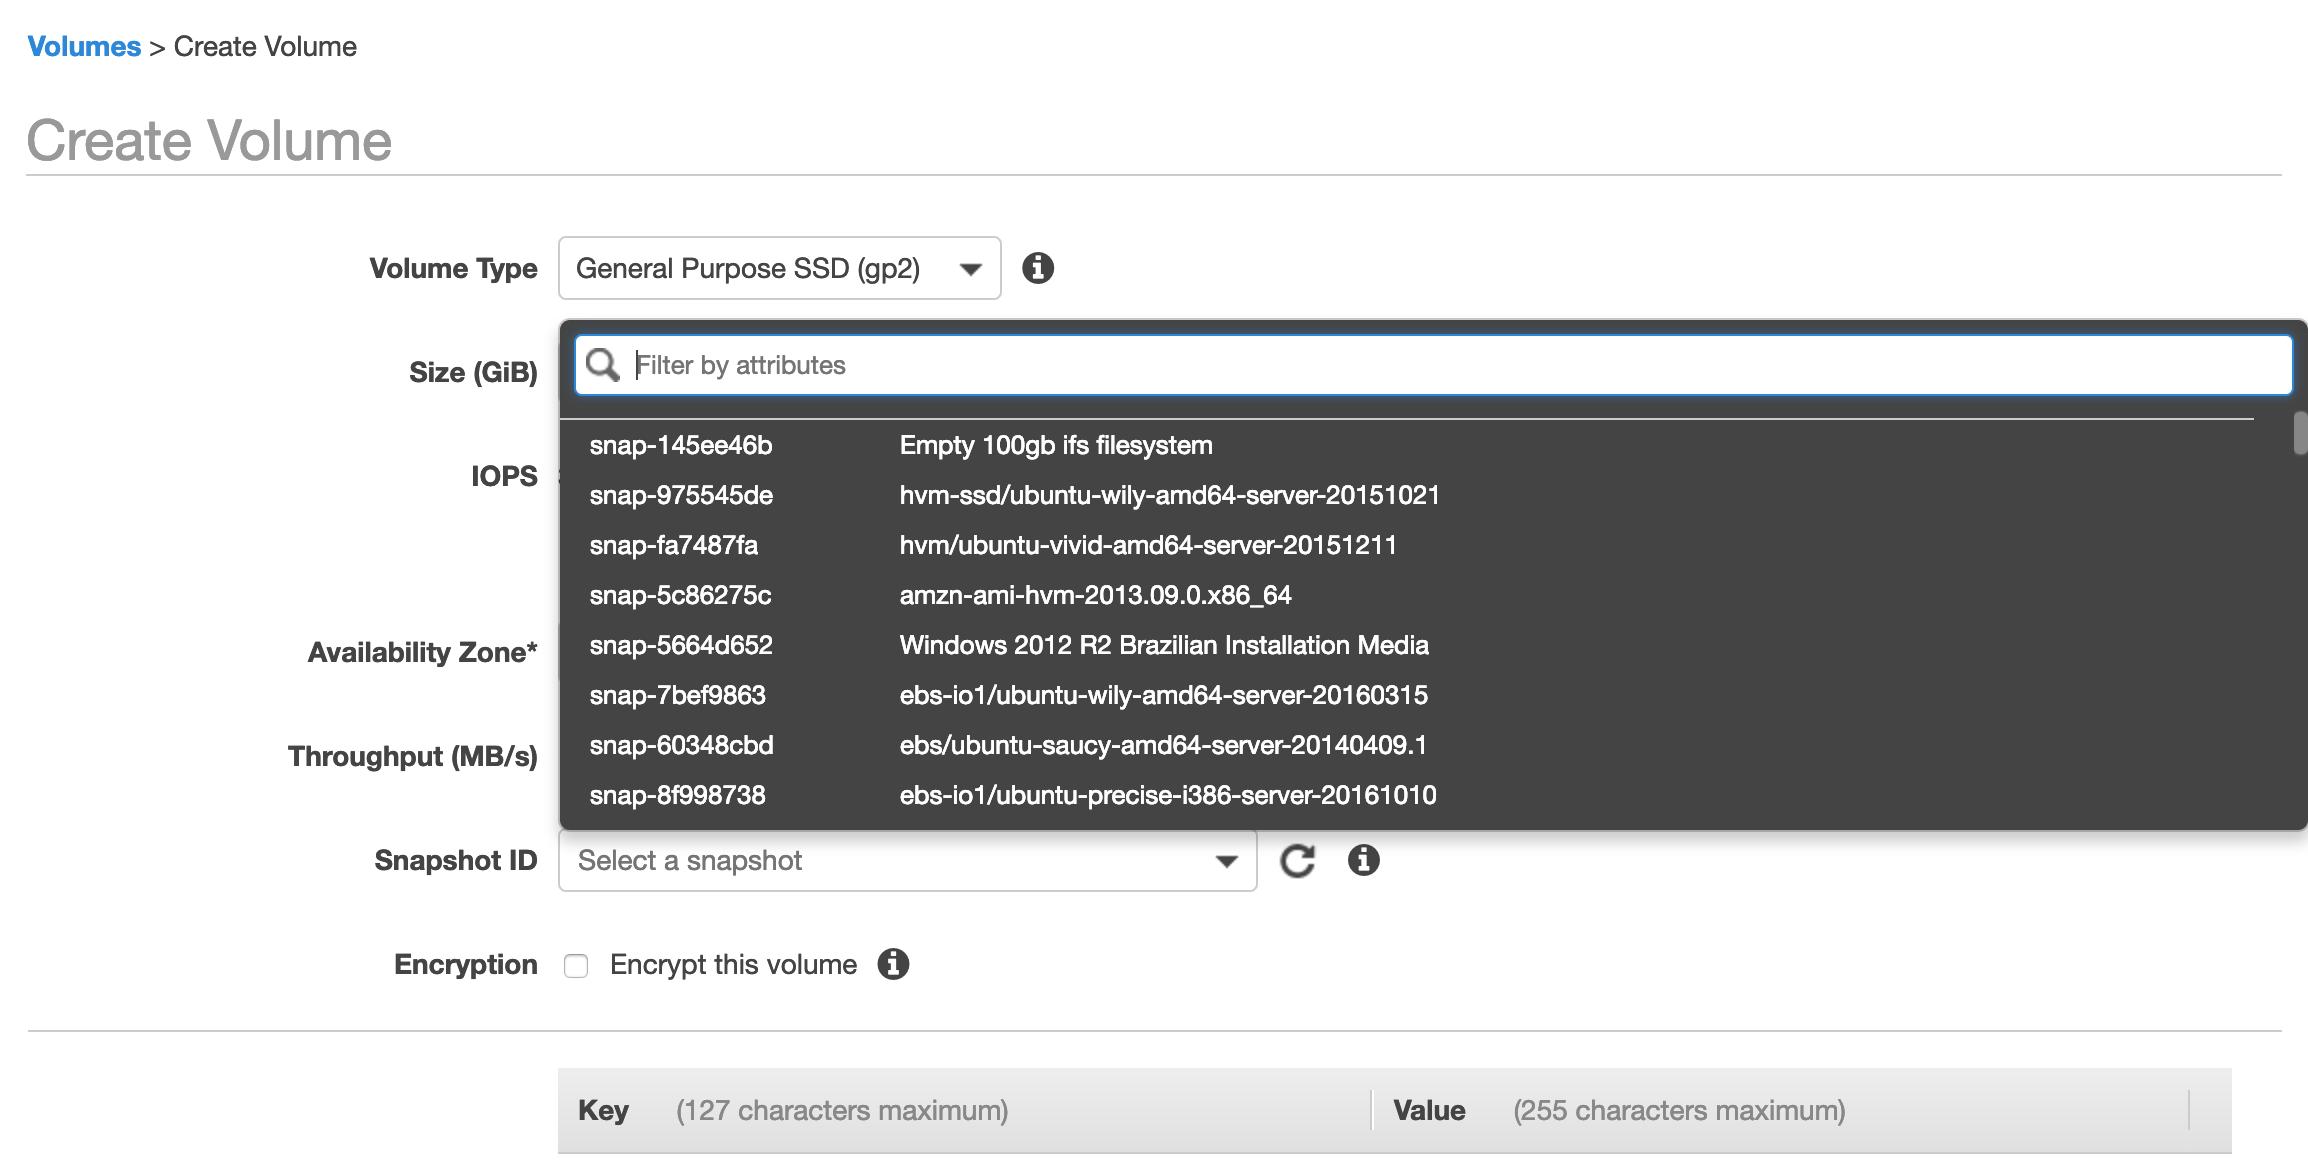 Select EBS Snapshot ID when I create a new EBS Volume [#3034959